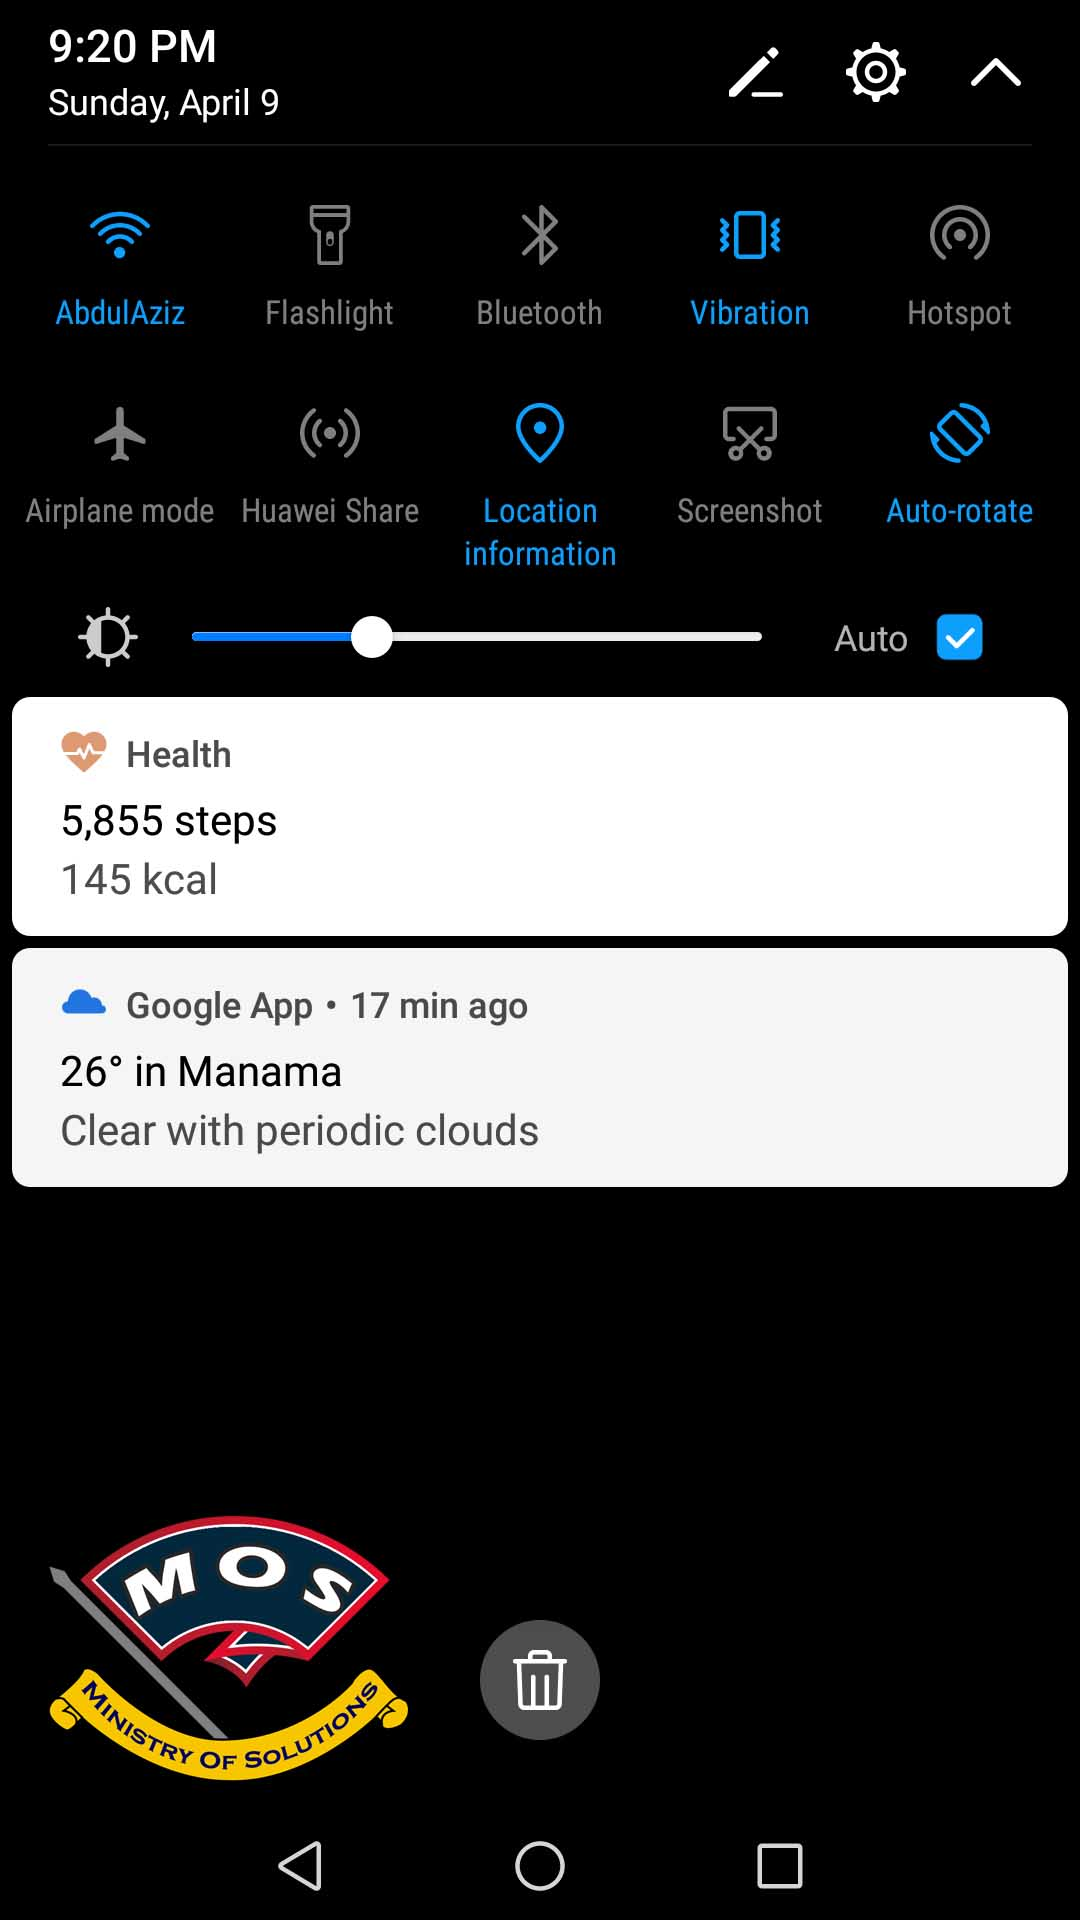 Huawei Honor 6X BLN-L21 Nougat B342 Update EMUI5 (Middle